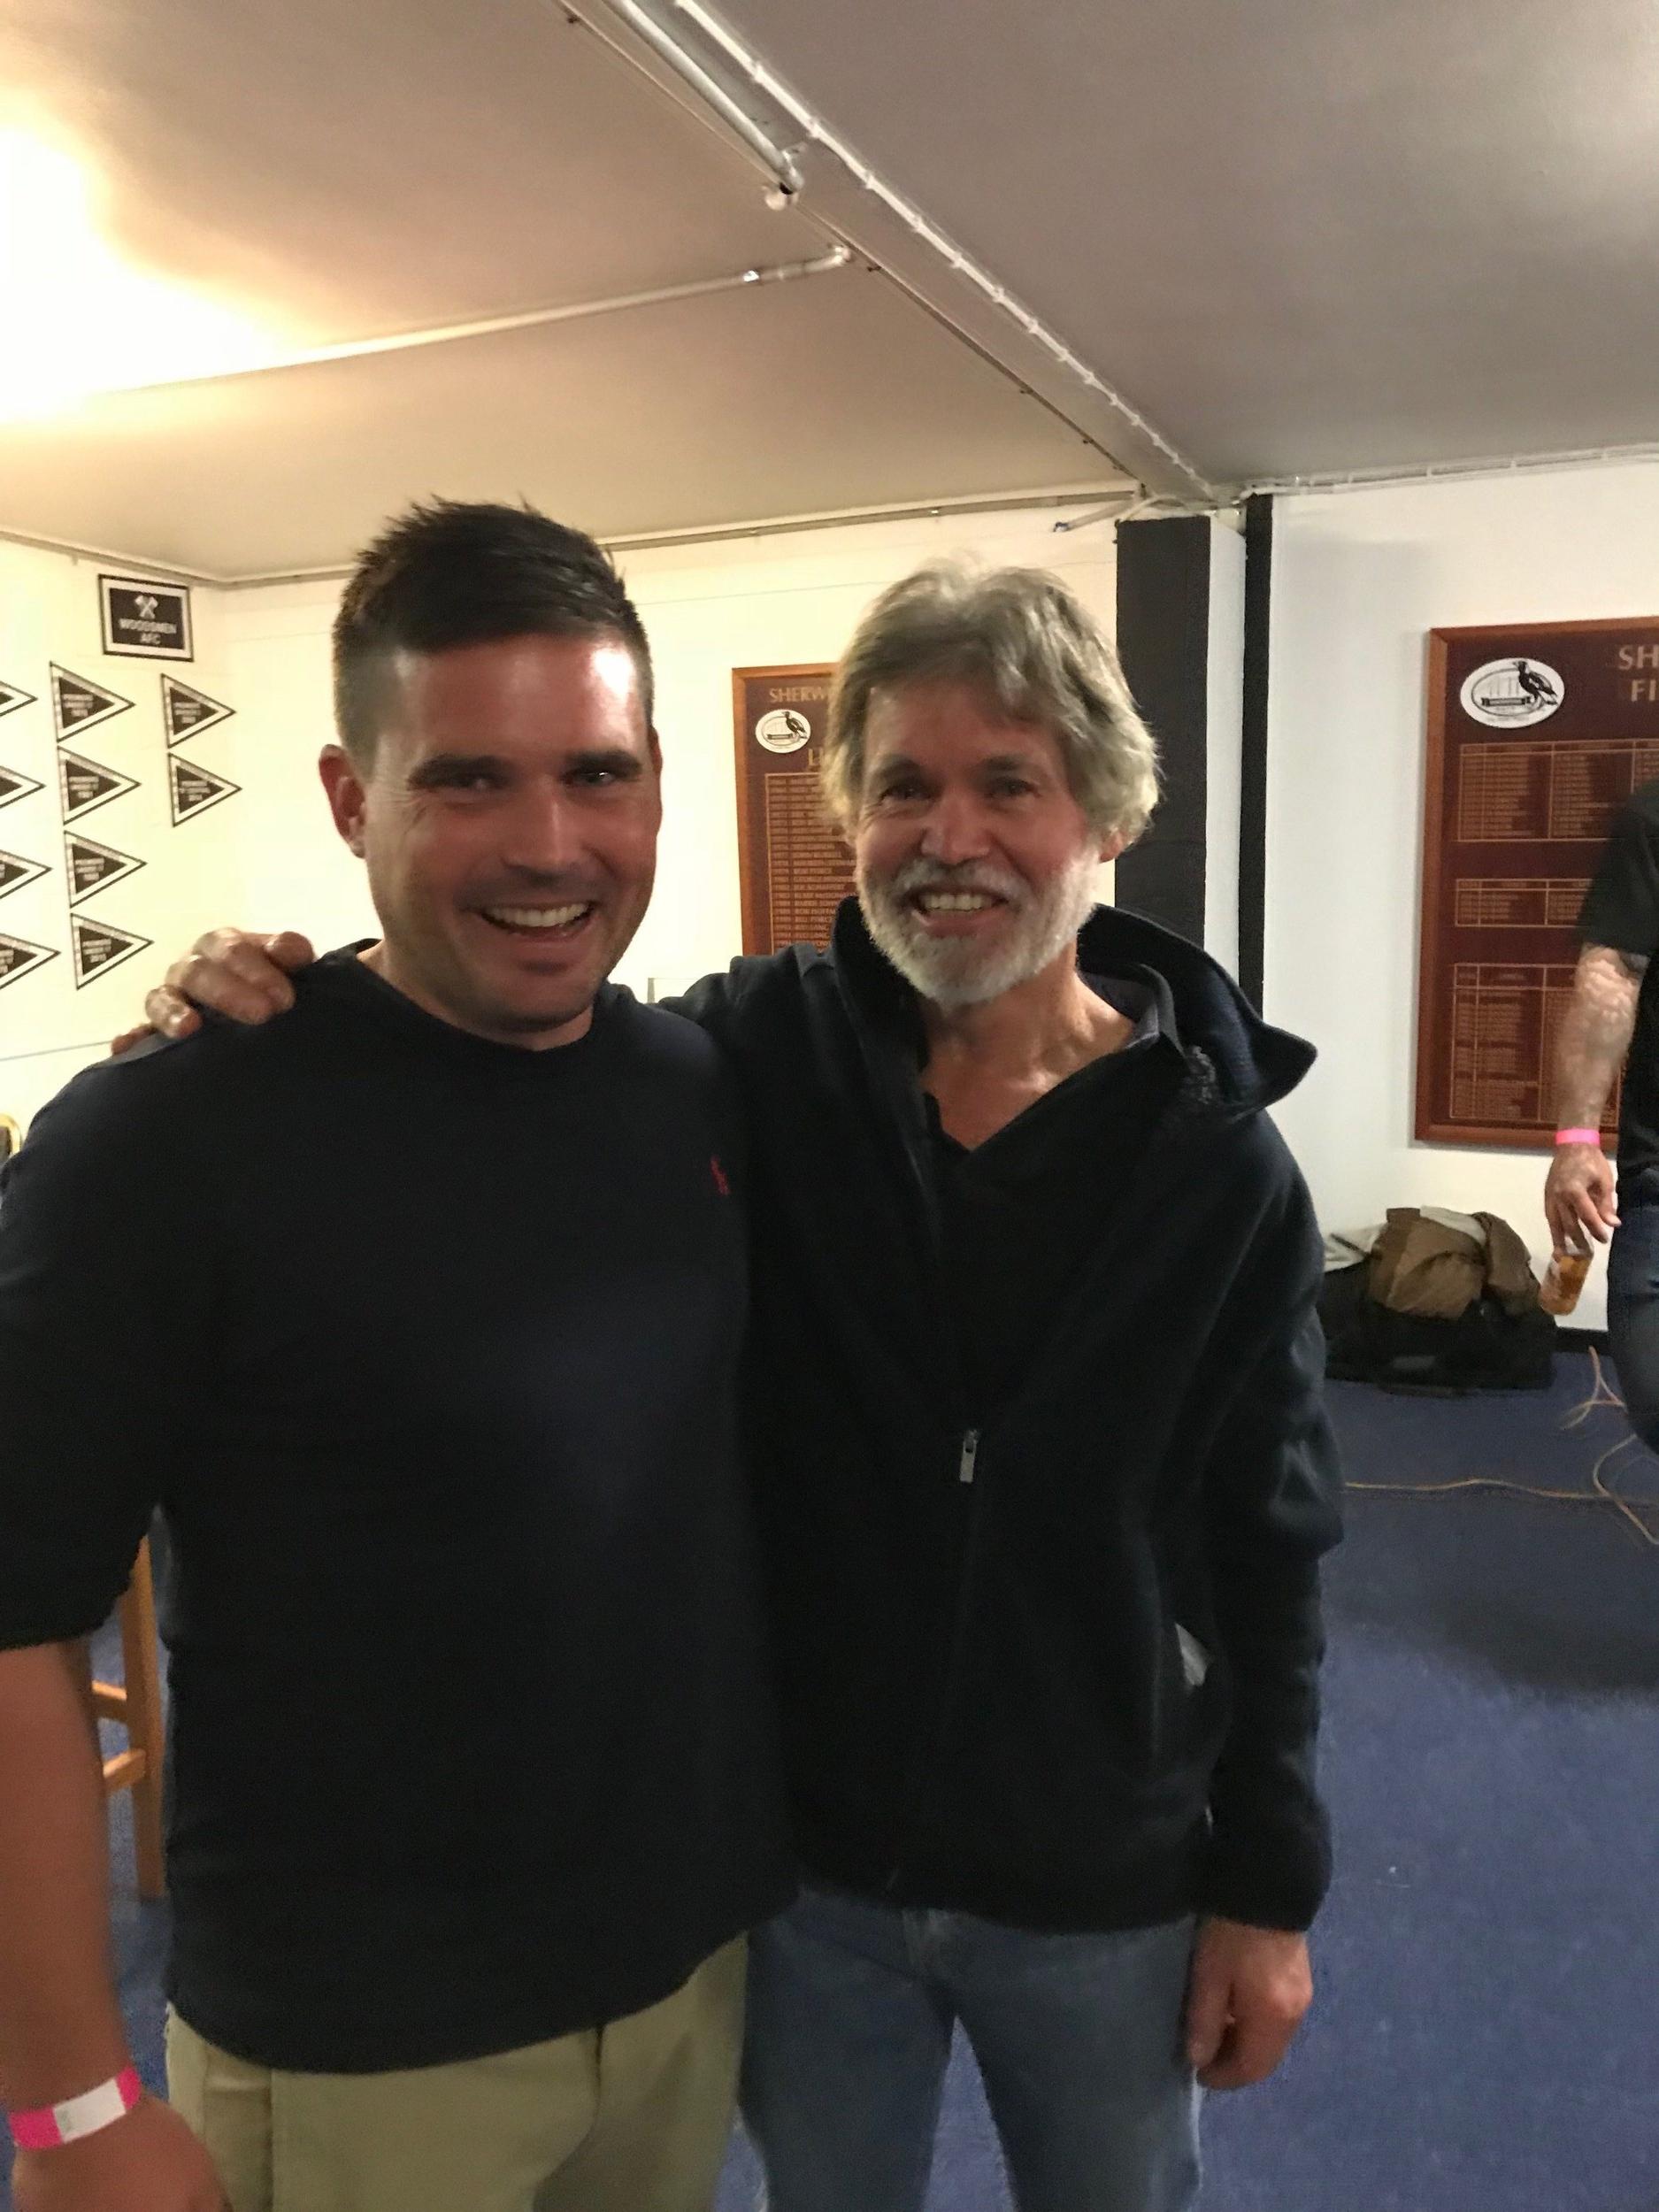 Chris & John Judson - both Magpie Premiership players multiple times.